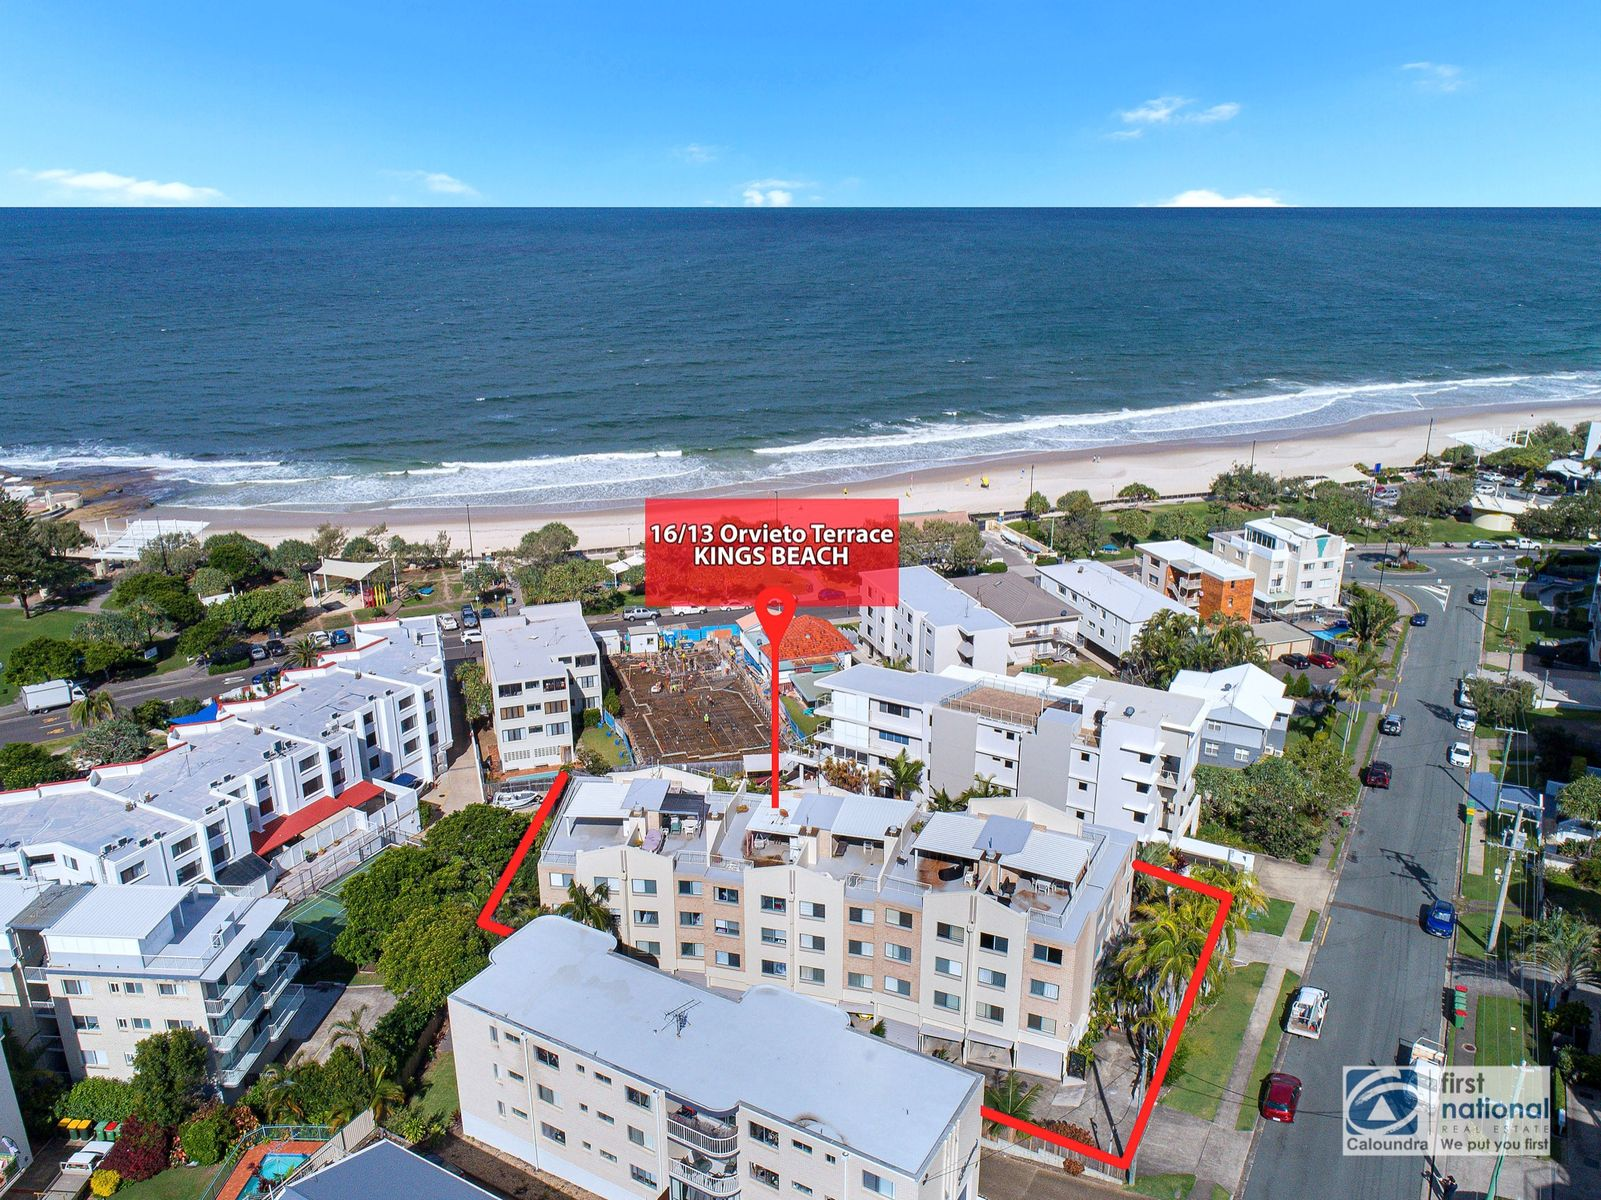 16/13 Orvieto Terrace, Kings Beach, QLD 4551